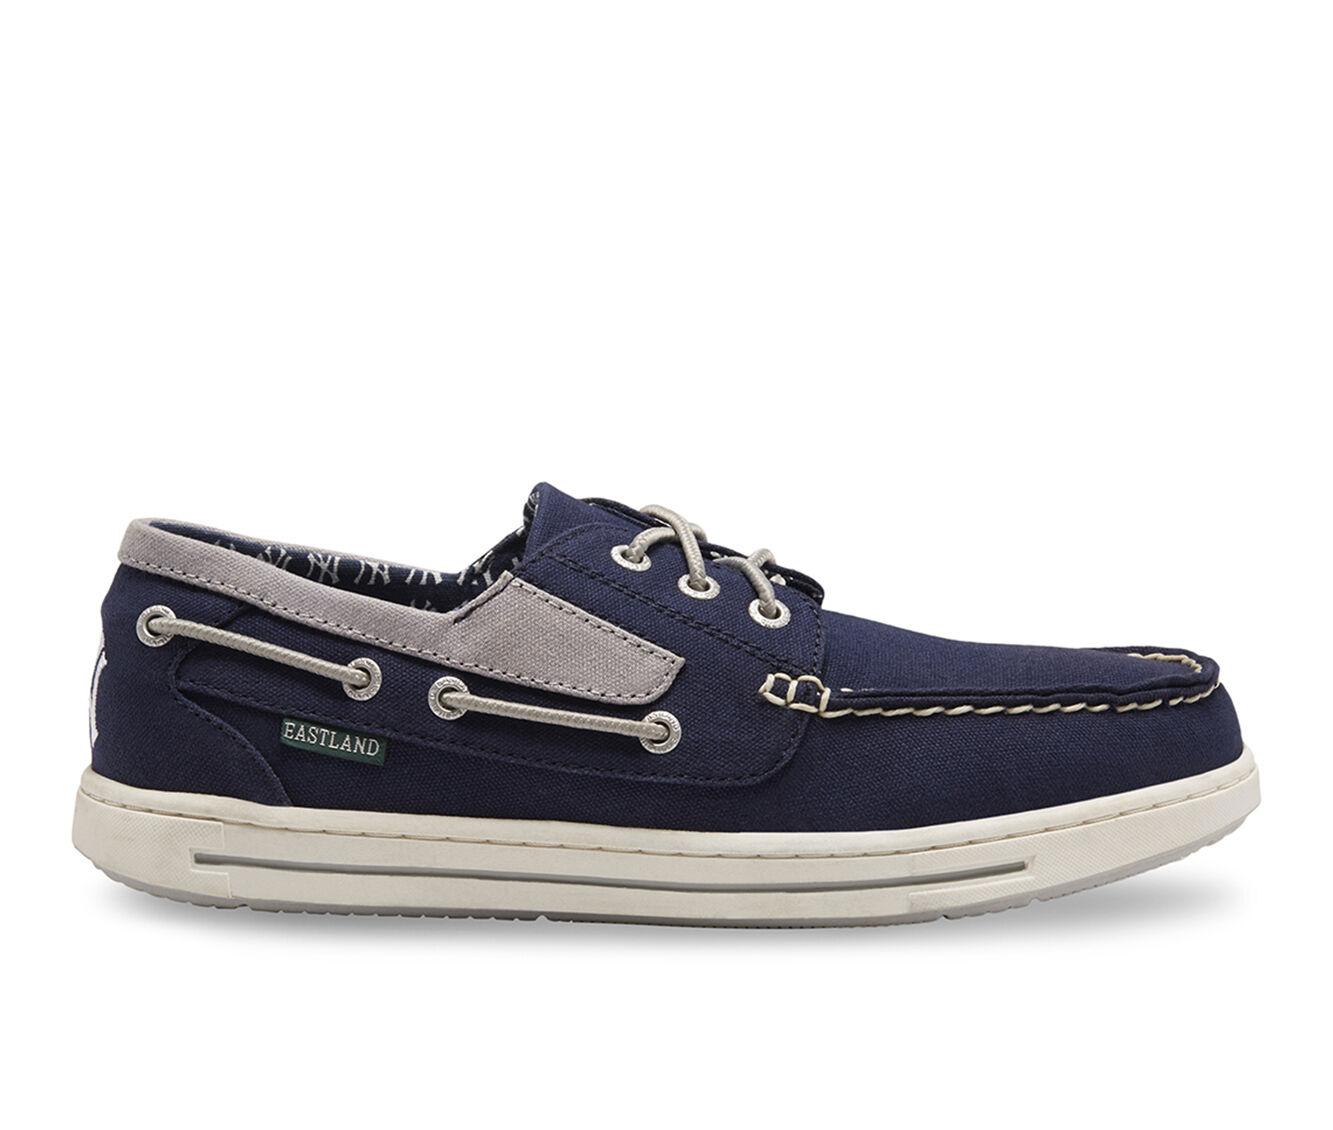 Men's Eastland Adventure MLB Yankees Boat Shoes Blue